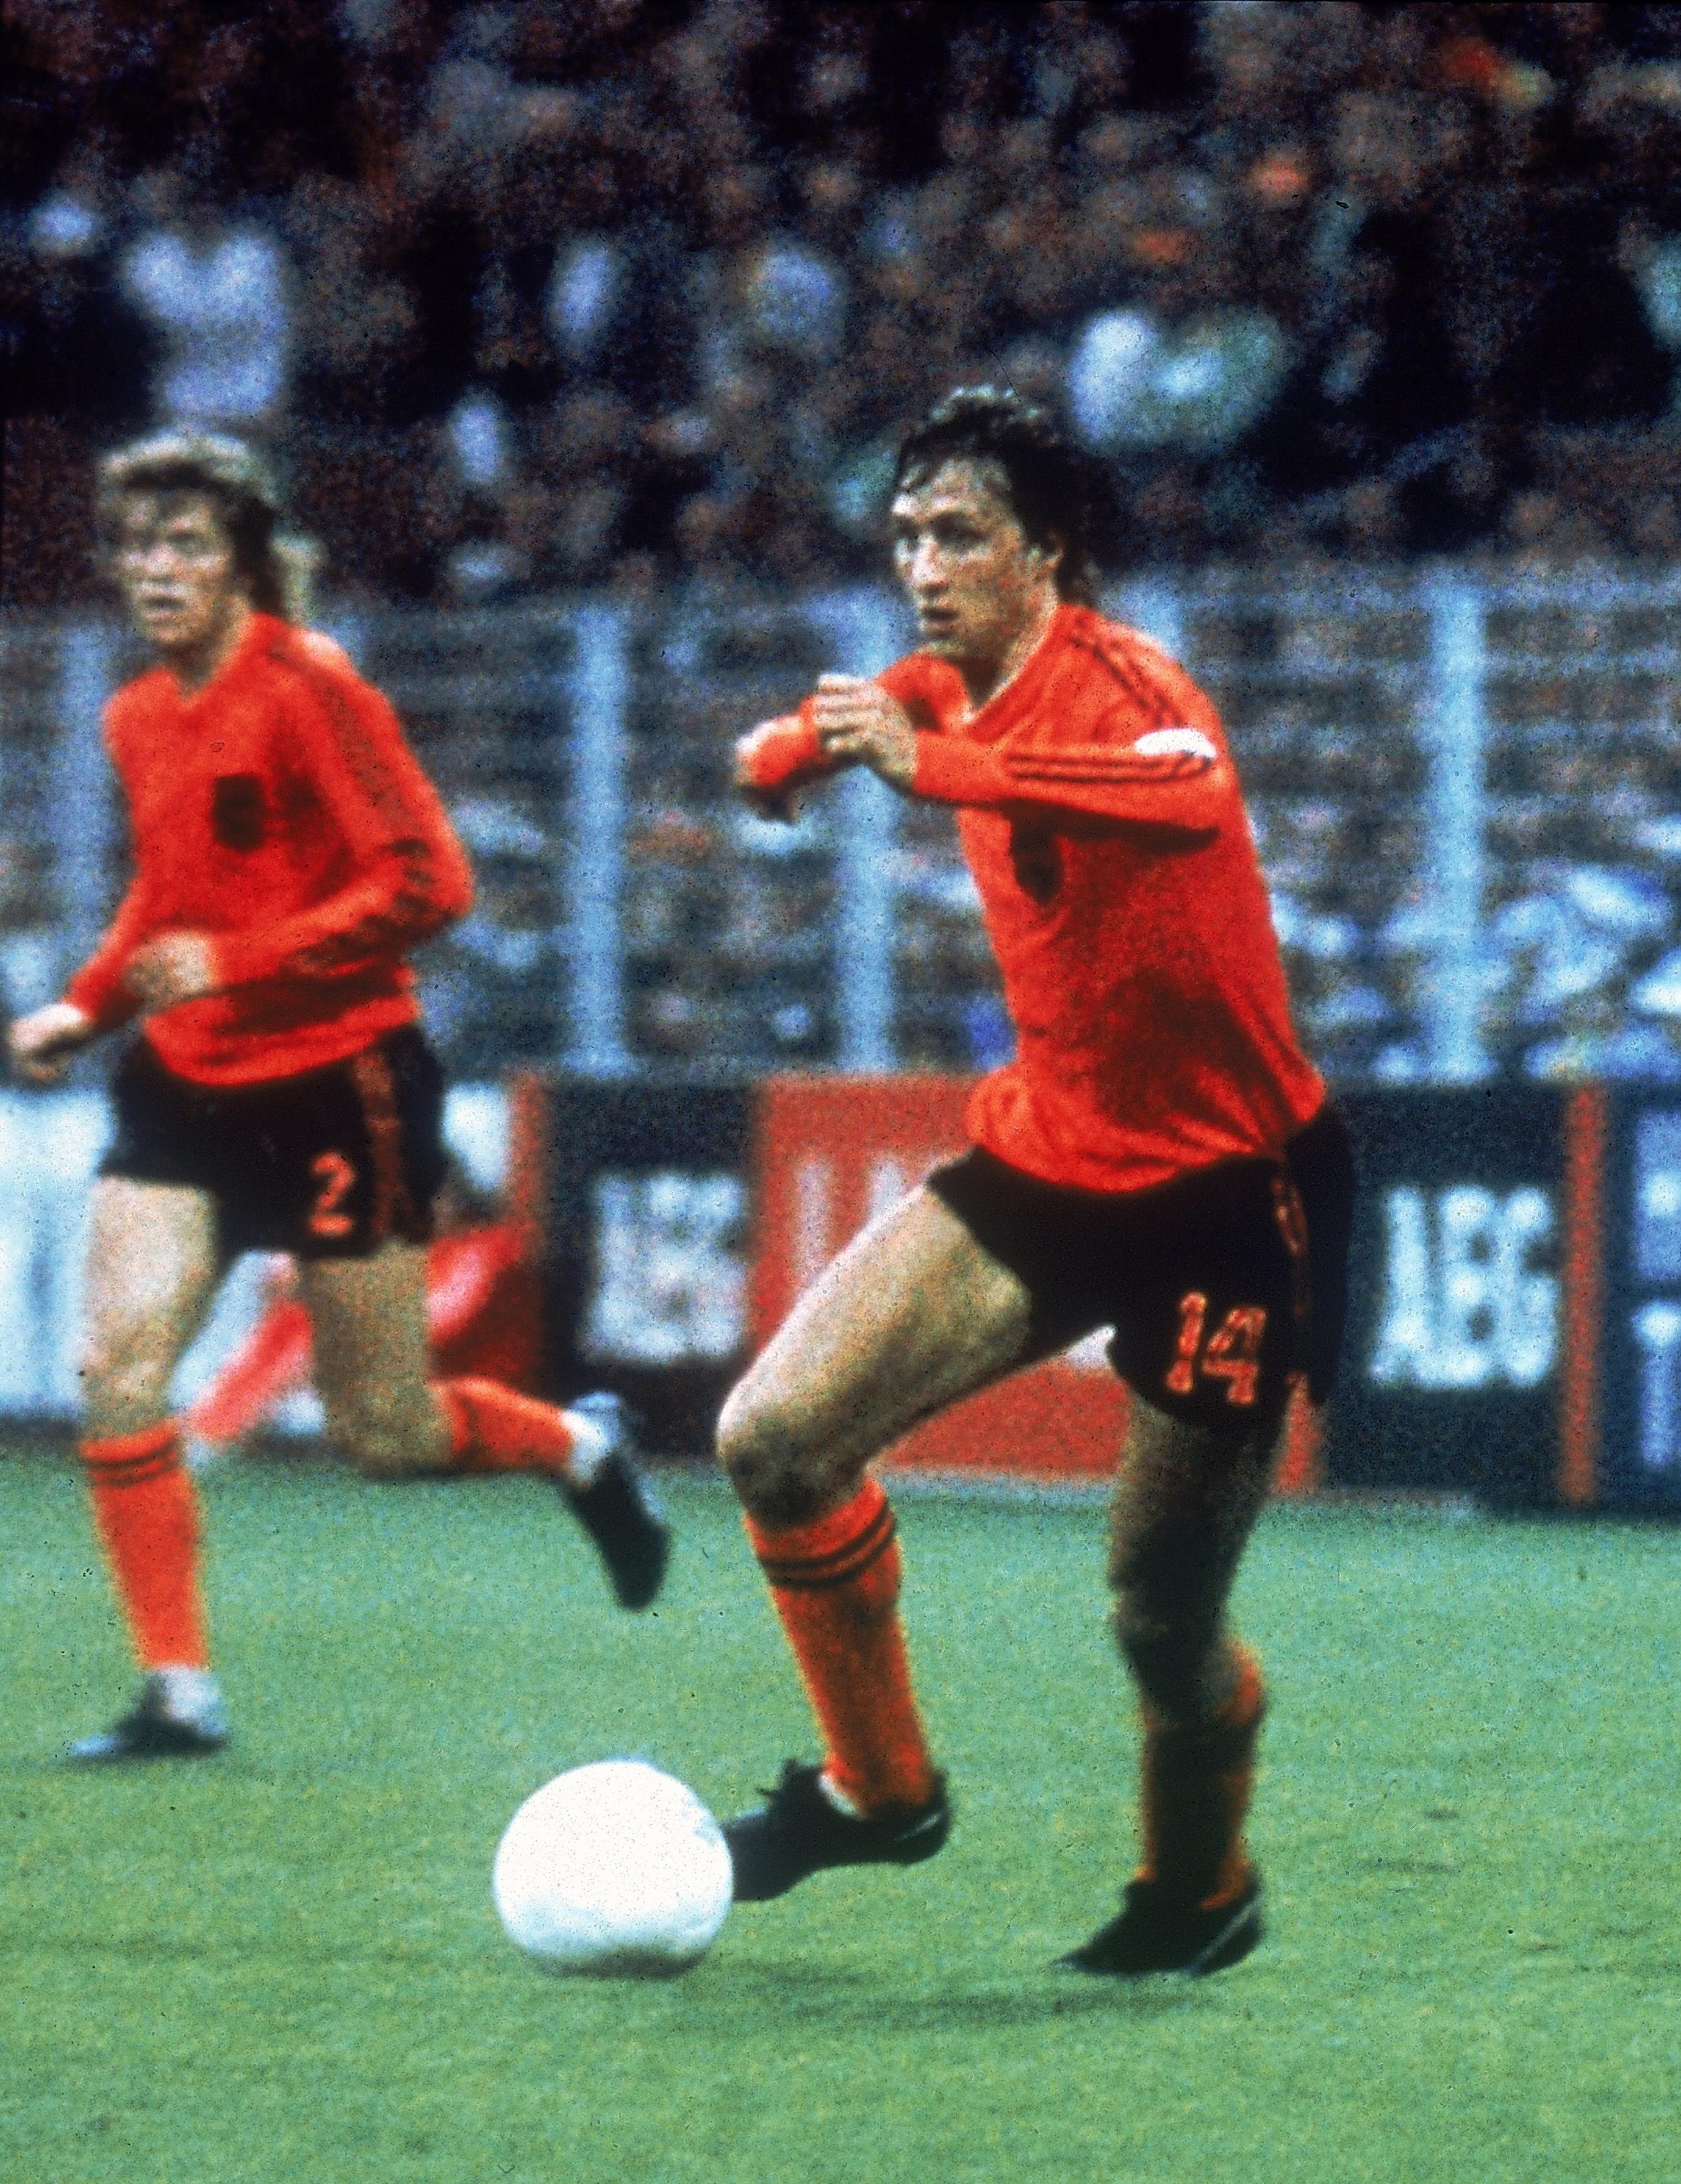 19 Jun 1974:  Johan Cruyff of Holland in action during the World Cup match against Sweden played at the Westfalenstadion in Dortmund, Germany. \ Mandatory Credit: Allsport UK /Allsport